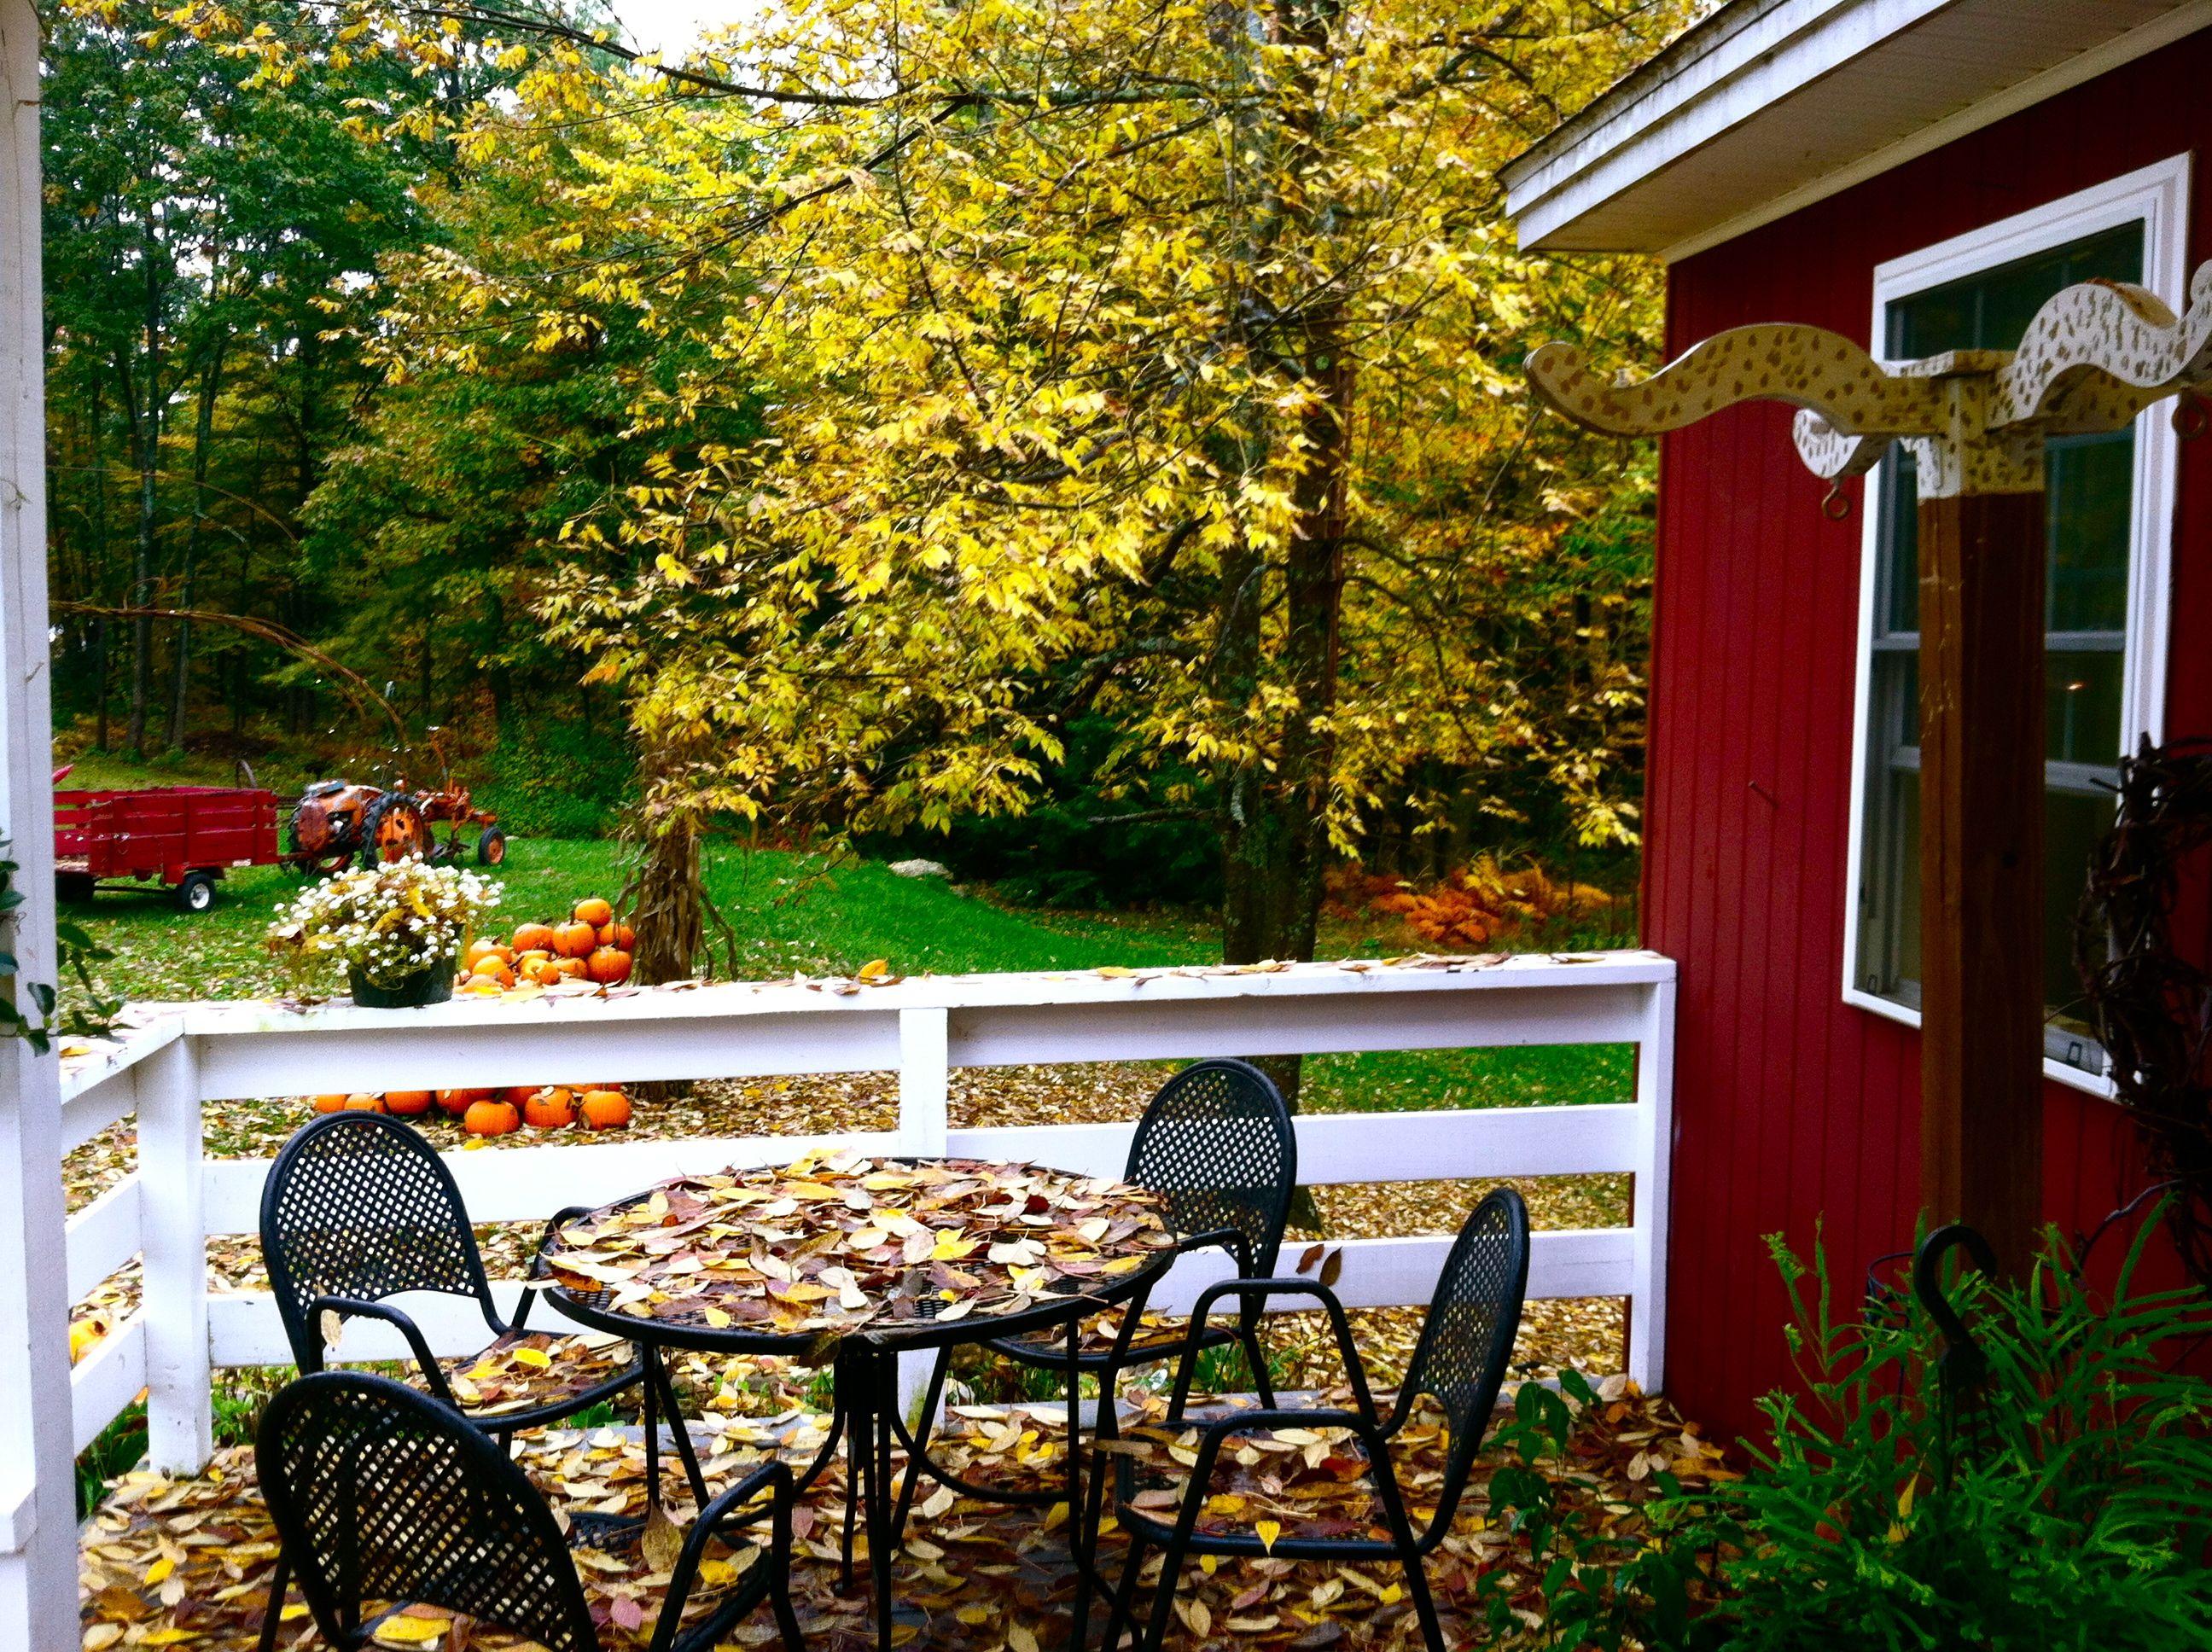 The Kitchen Garden in Templeton, MA